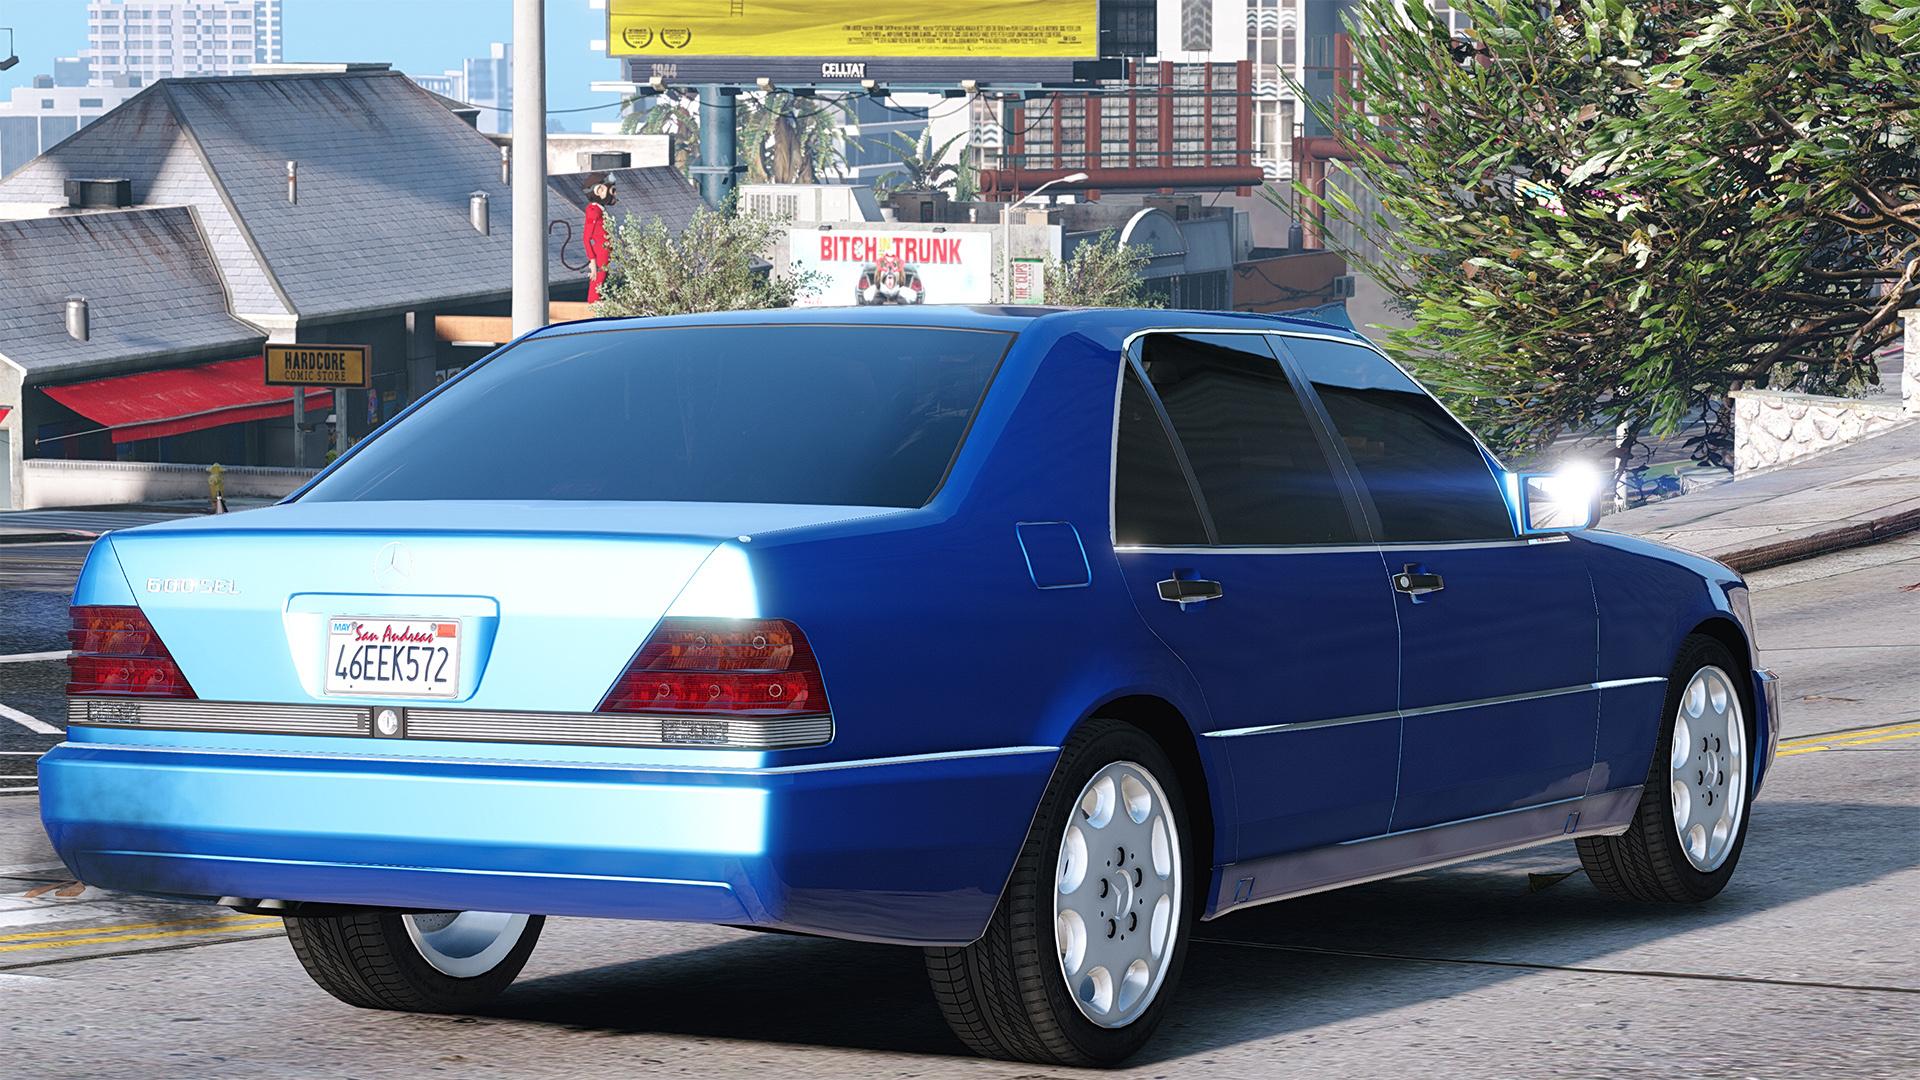 Mercedes-Benz 600 SEL W140 Add-On / Replace - GTA5-Mods.com